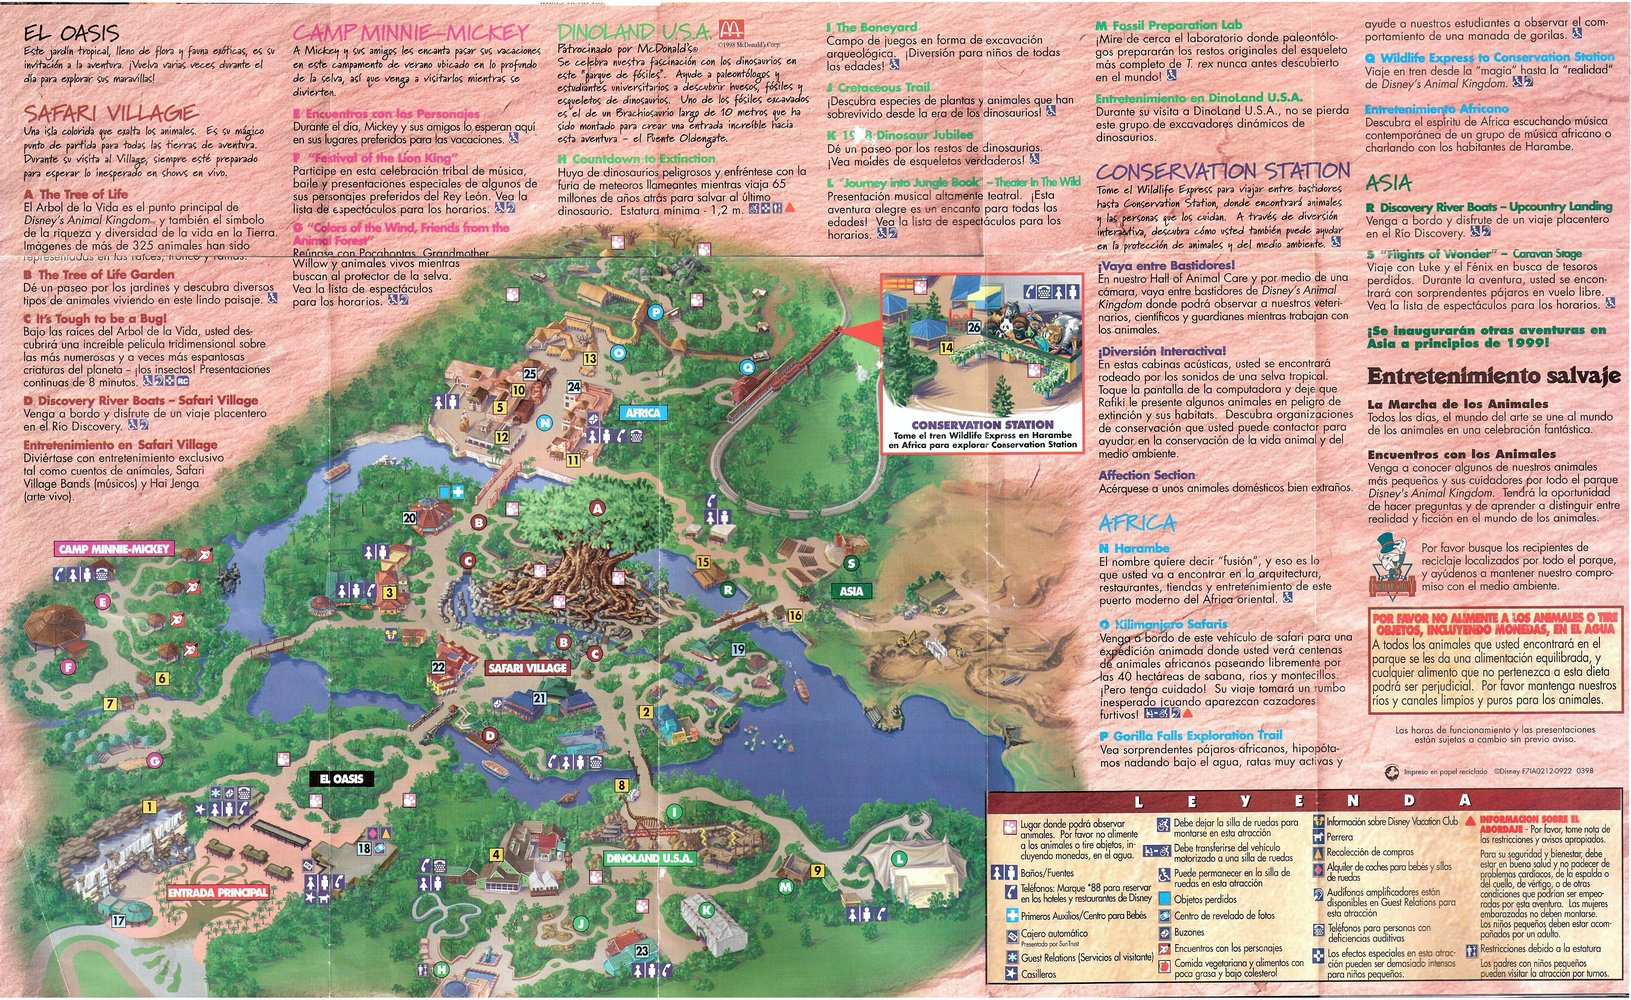 Captivating Animal Kingdom 98 2